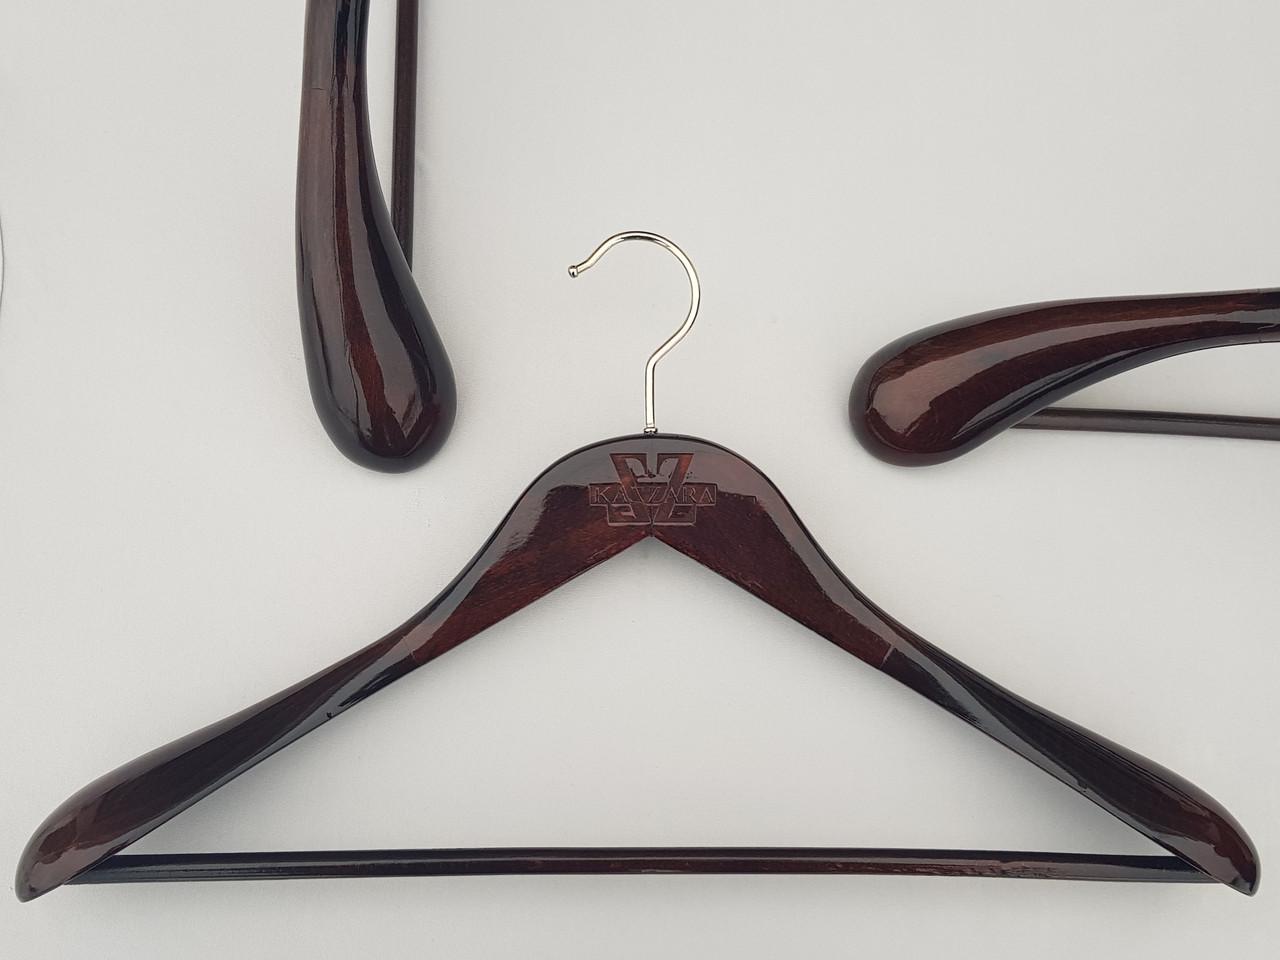 Плечики Mainetti Kazara Royal-2, длина 45 см